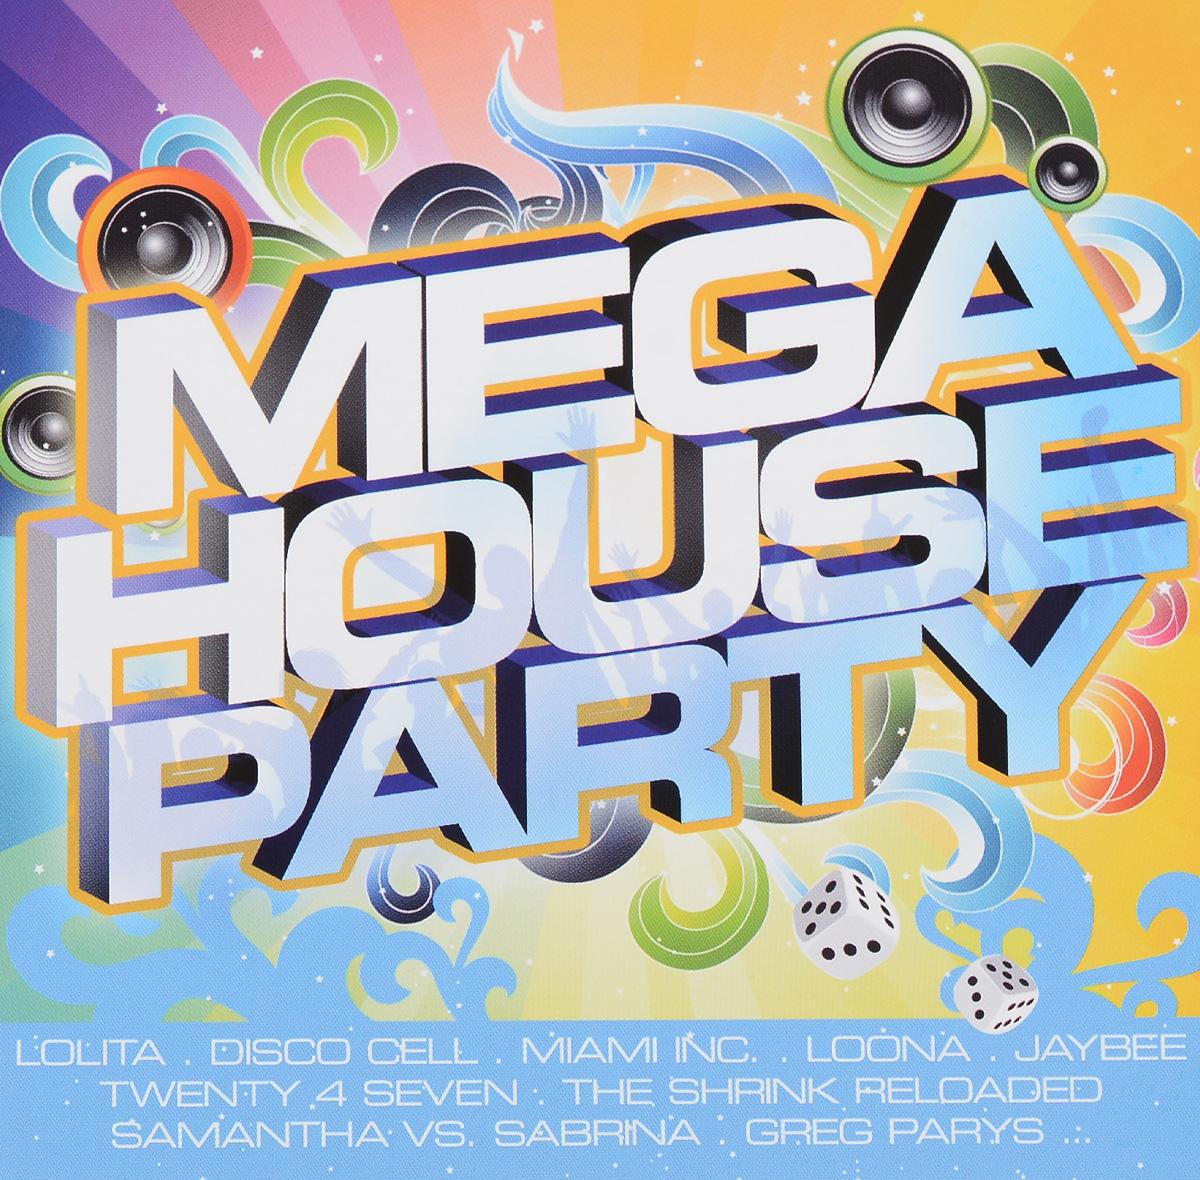 Miami Inc.,Disco Cell,Discotronix,Loona,Oscar Sallguero,Glamrock Brothers,Том Маунтин,Nicco,House-Maxx,Rudy MC,Hysterie,`Twenty 4 Seven`,The Shrinkk Reloaded,Sonic Revolution ,Dill,G&G,Lolita,Yenson,Money-G,Грег Пэрис Mega House Party (2 CD)